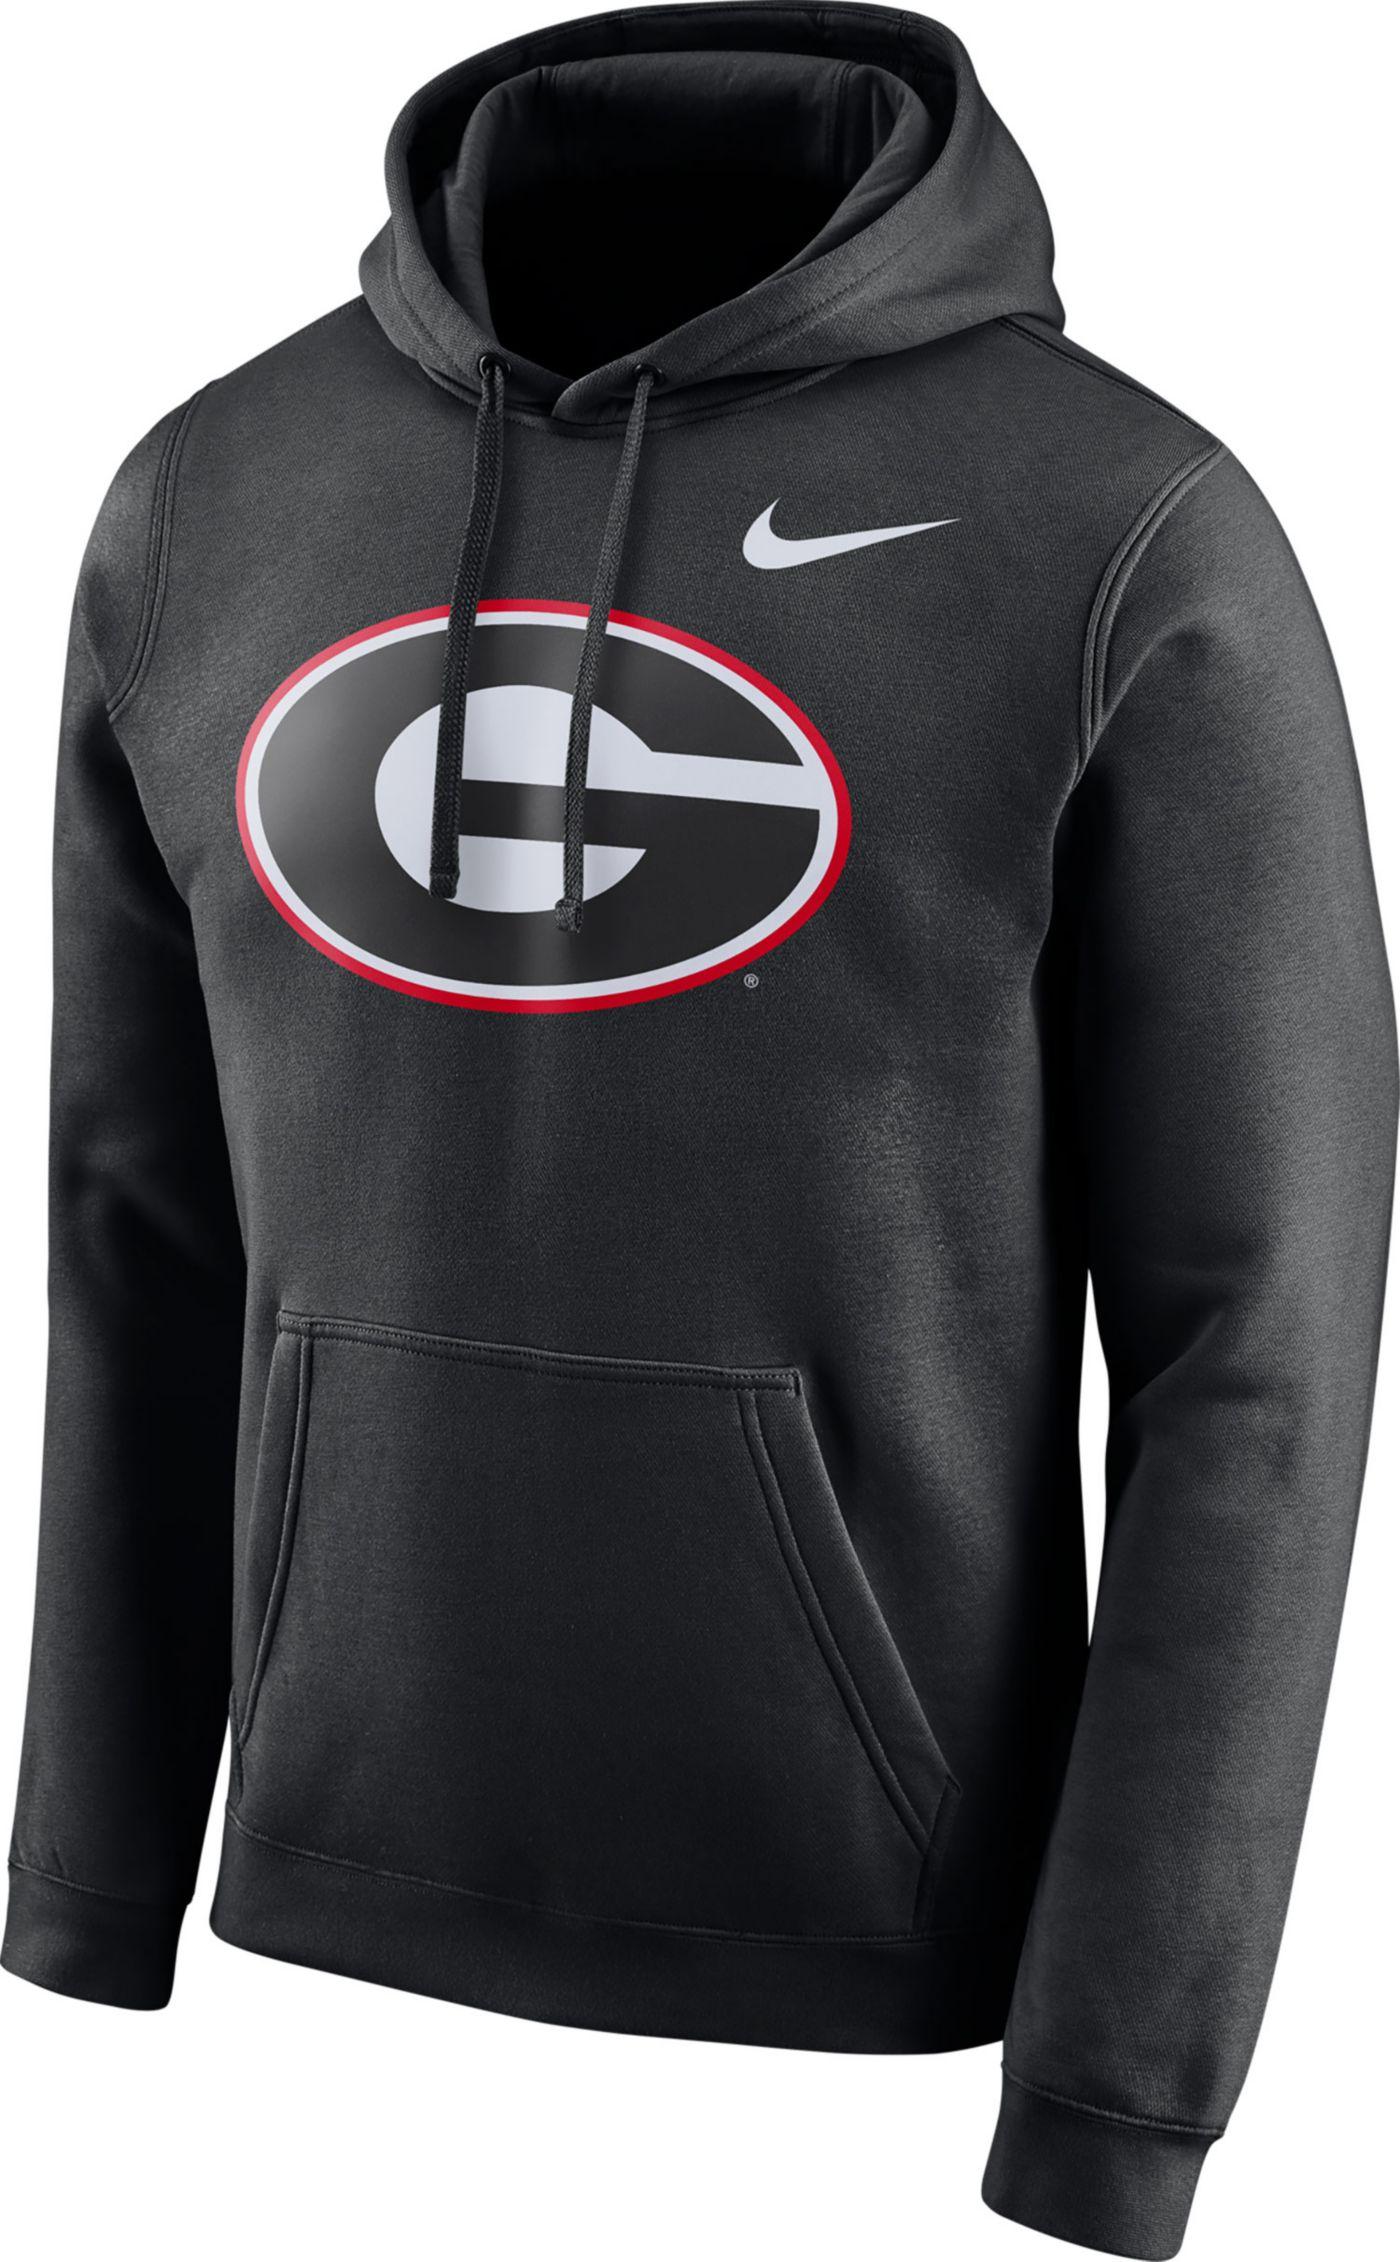 Nike Men's Georgia Bulldogs Club Fleece Pullover Black Hoodie